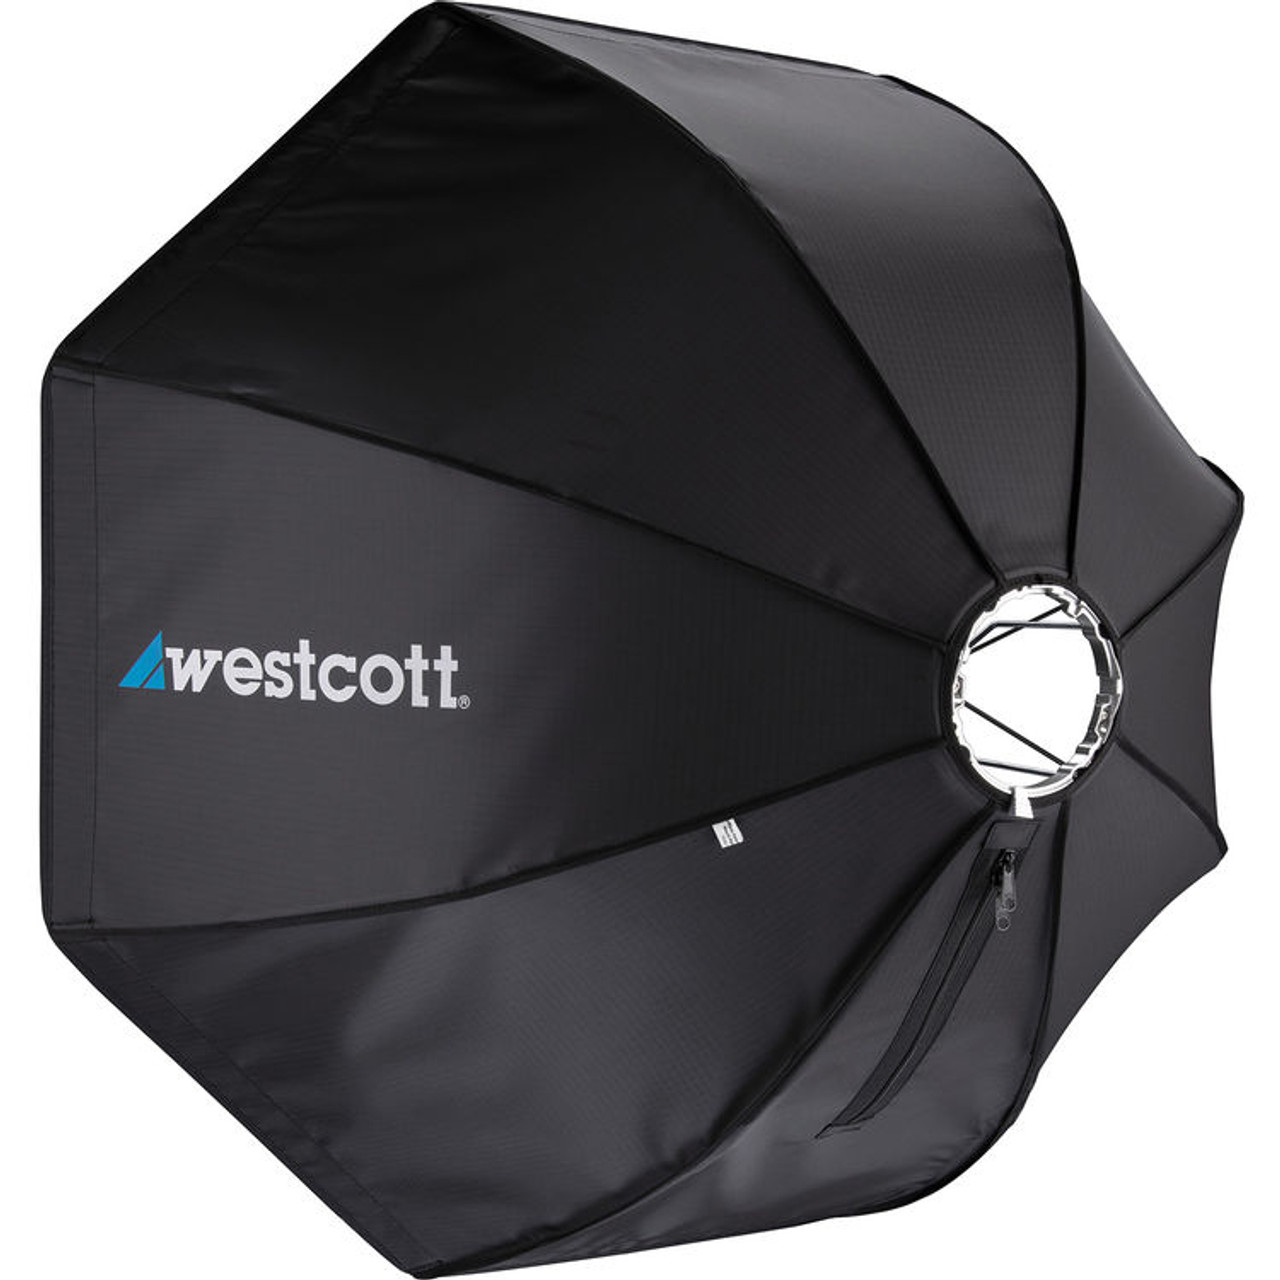 "Westcott Rapid Box Switch Octa-M Softbox 36"""